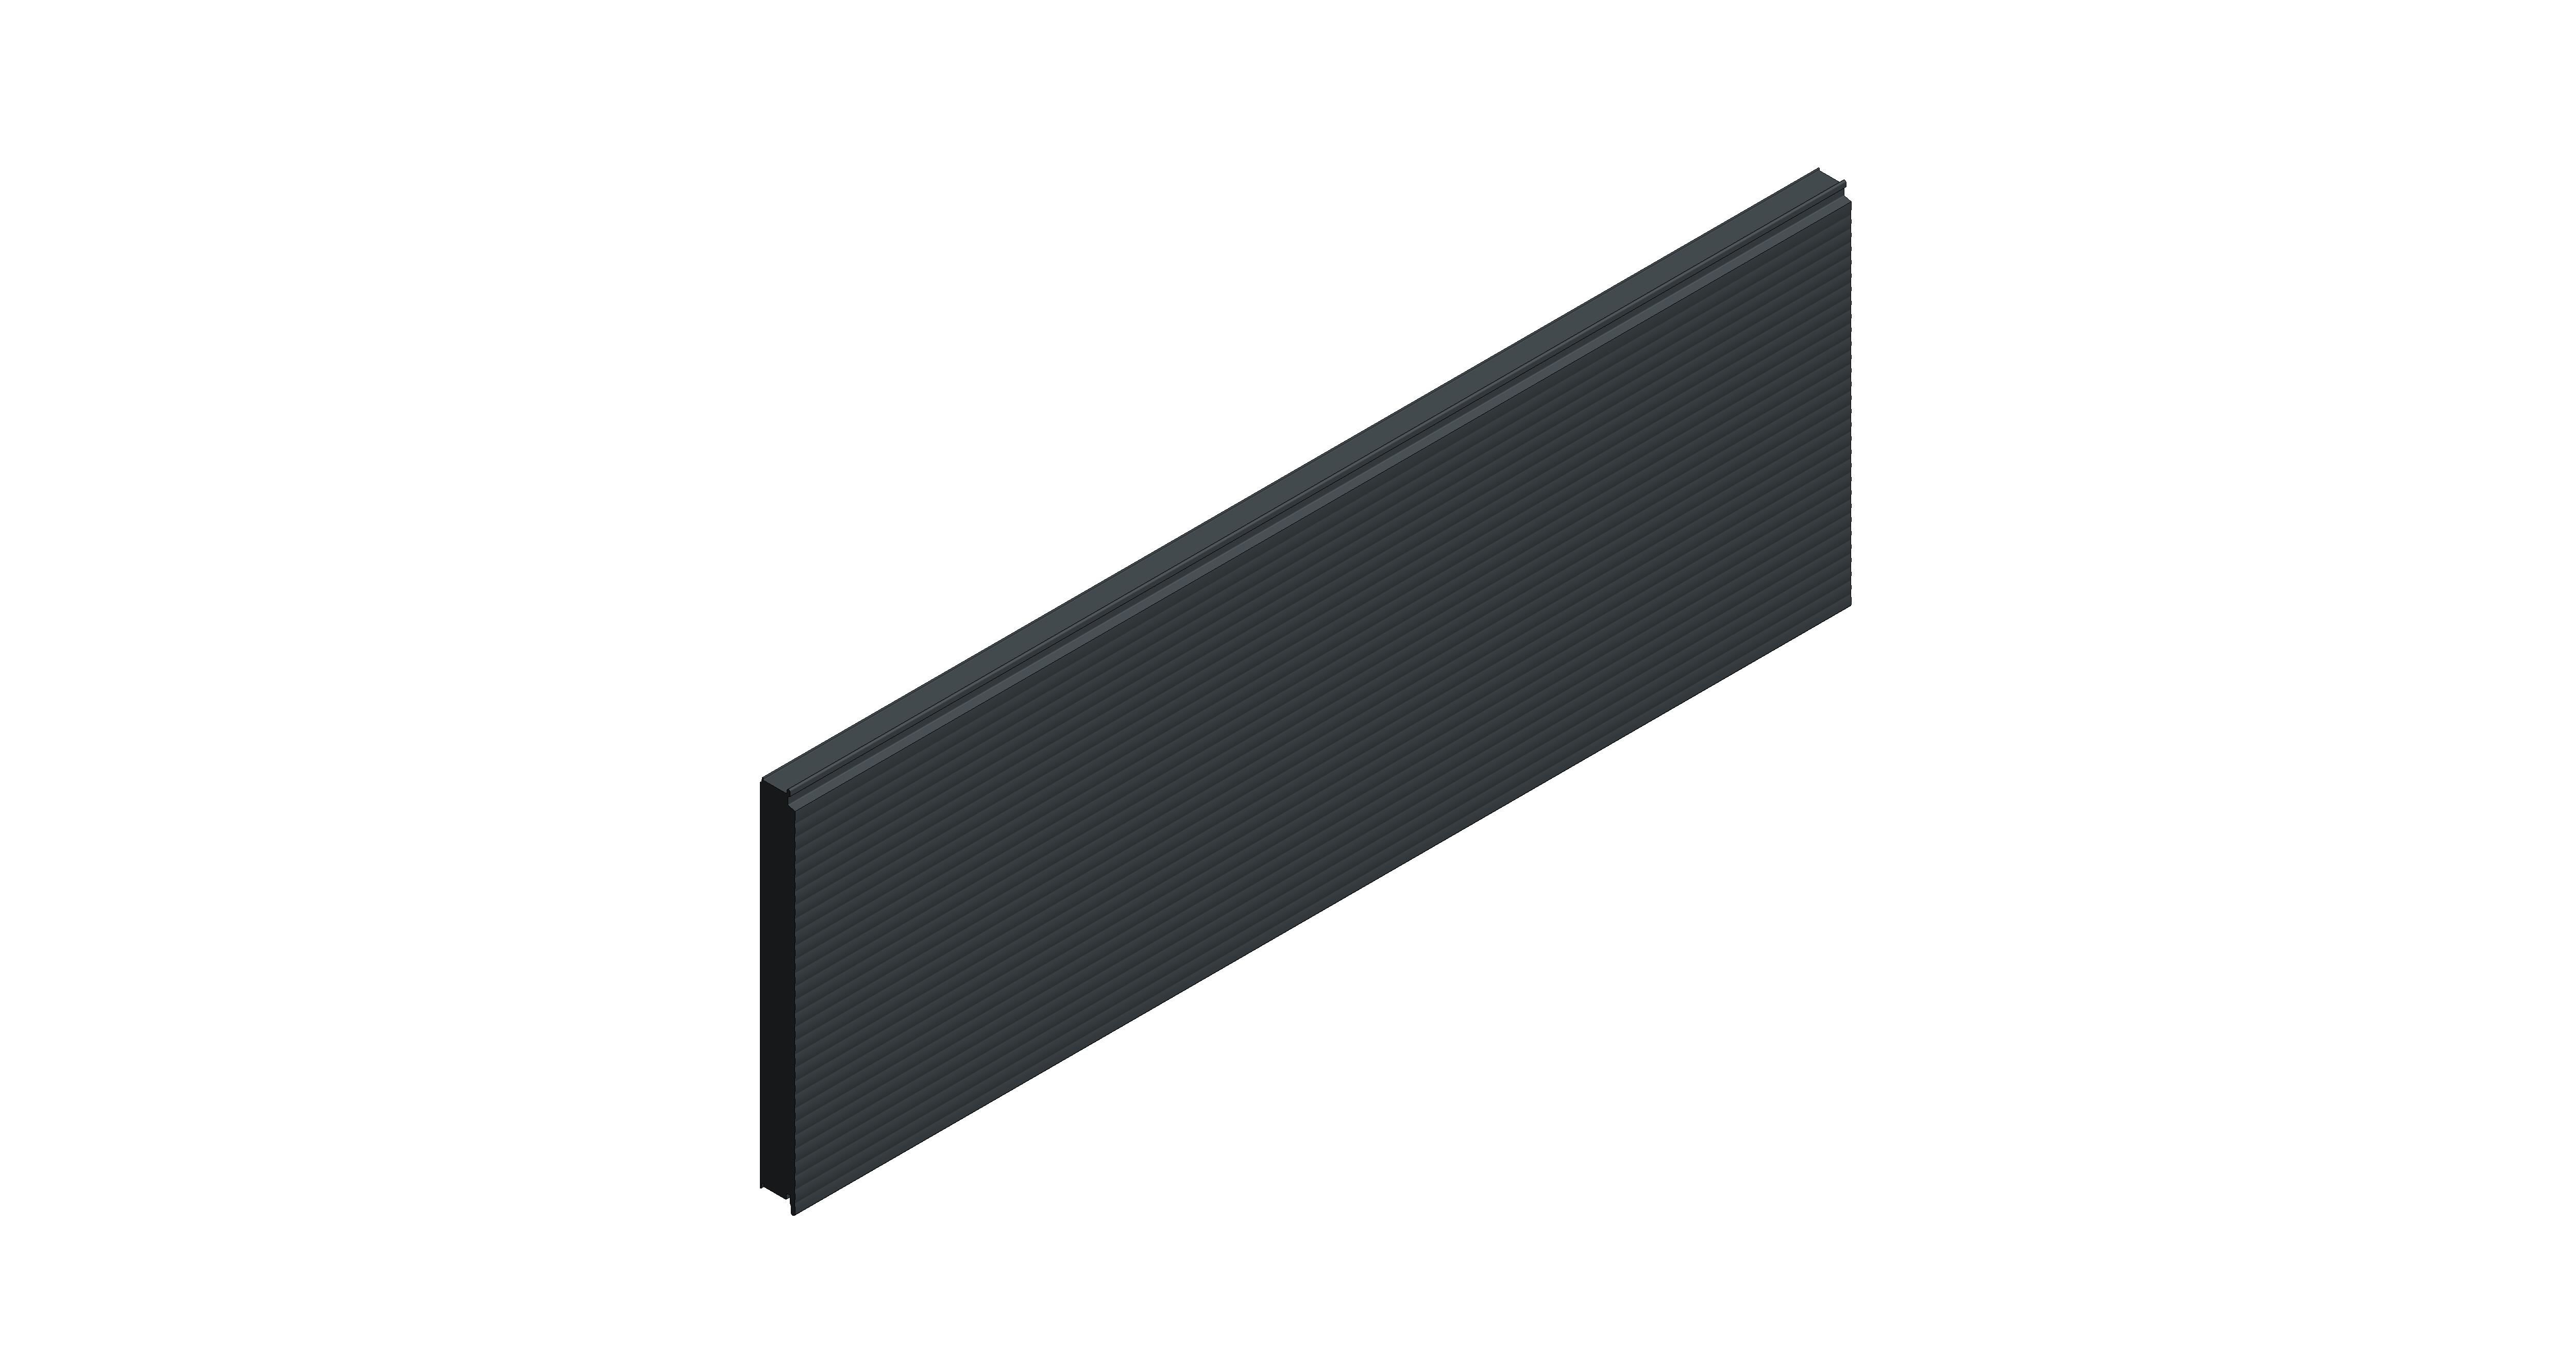 Kingspan cladding product image